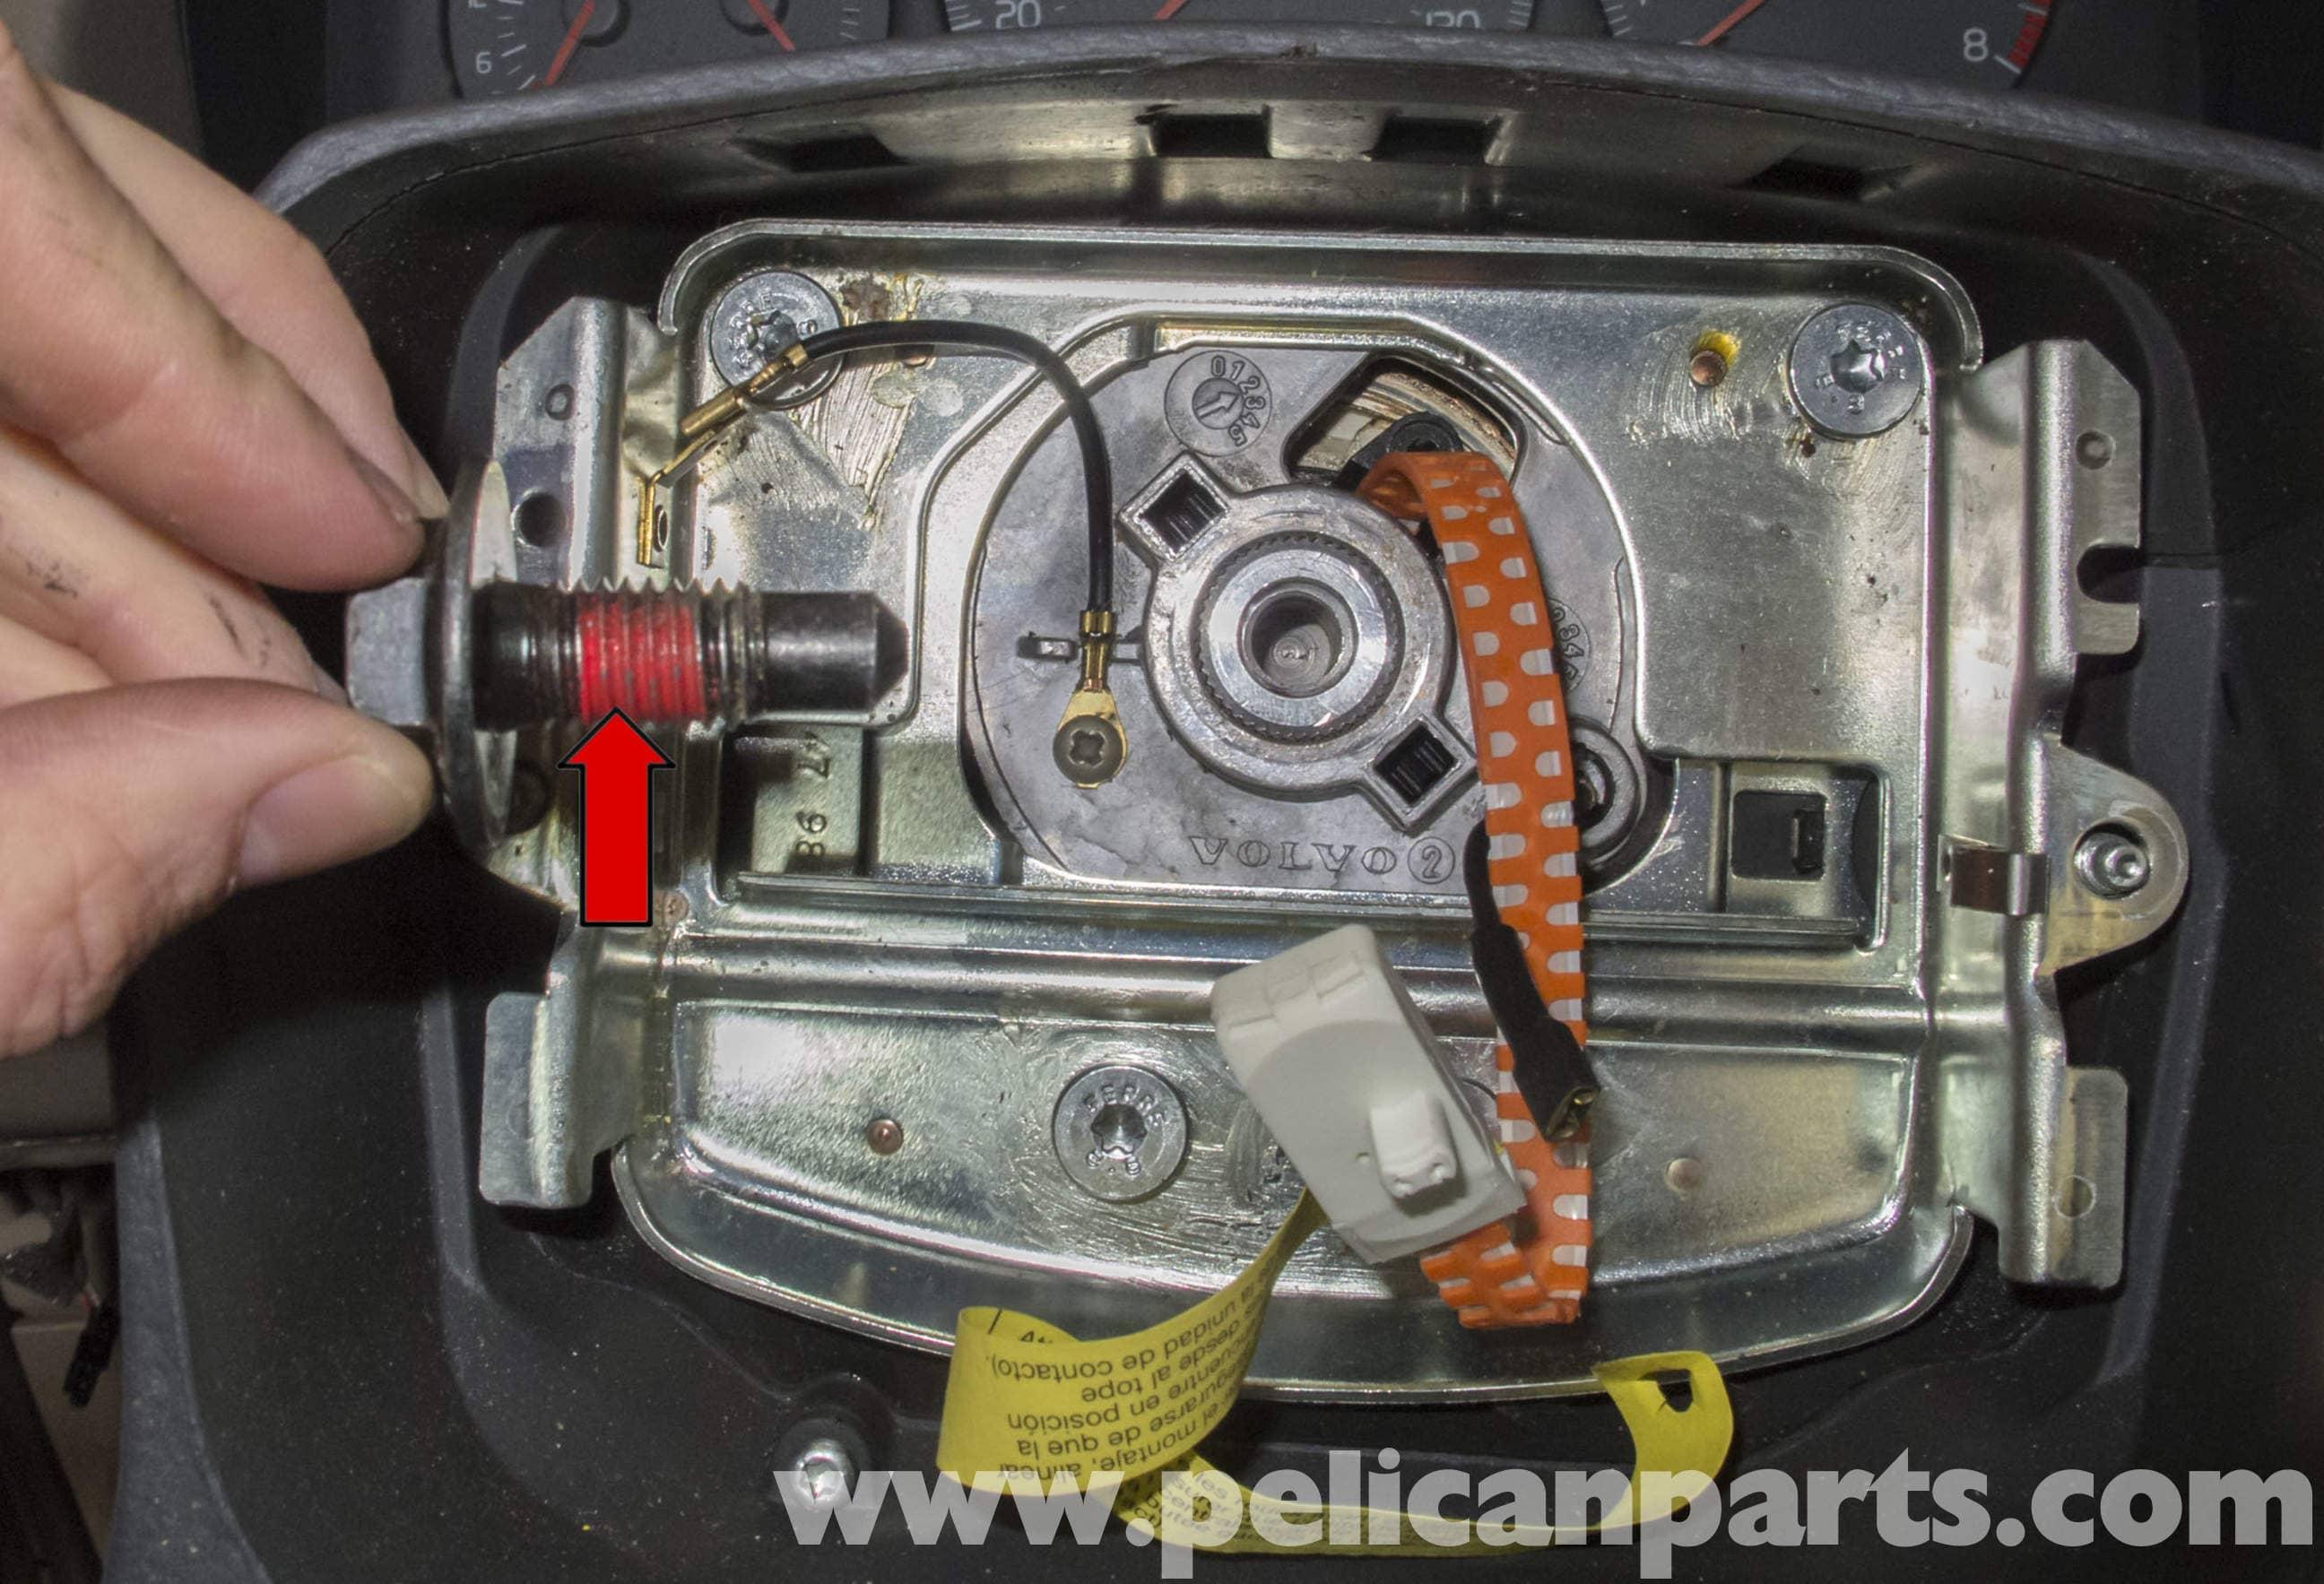 2000 Honda Accord Stereo Wiring Diagram Free Download Wiring Diagram